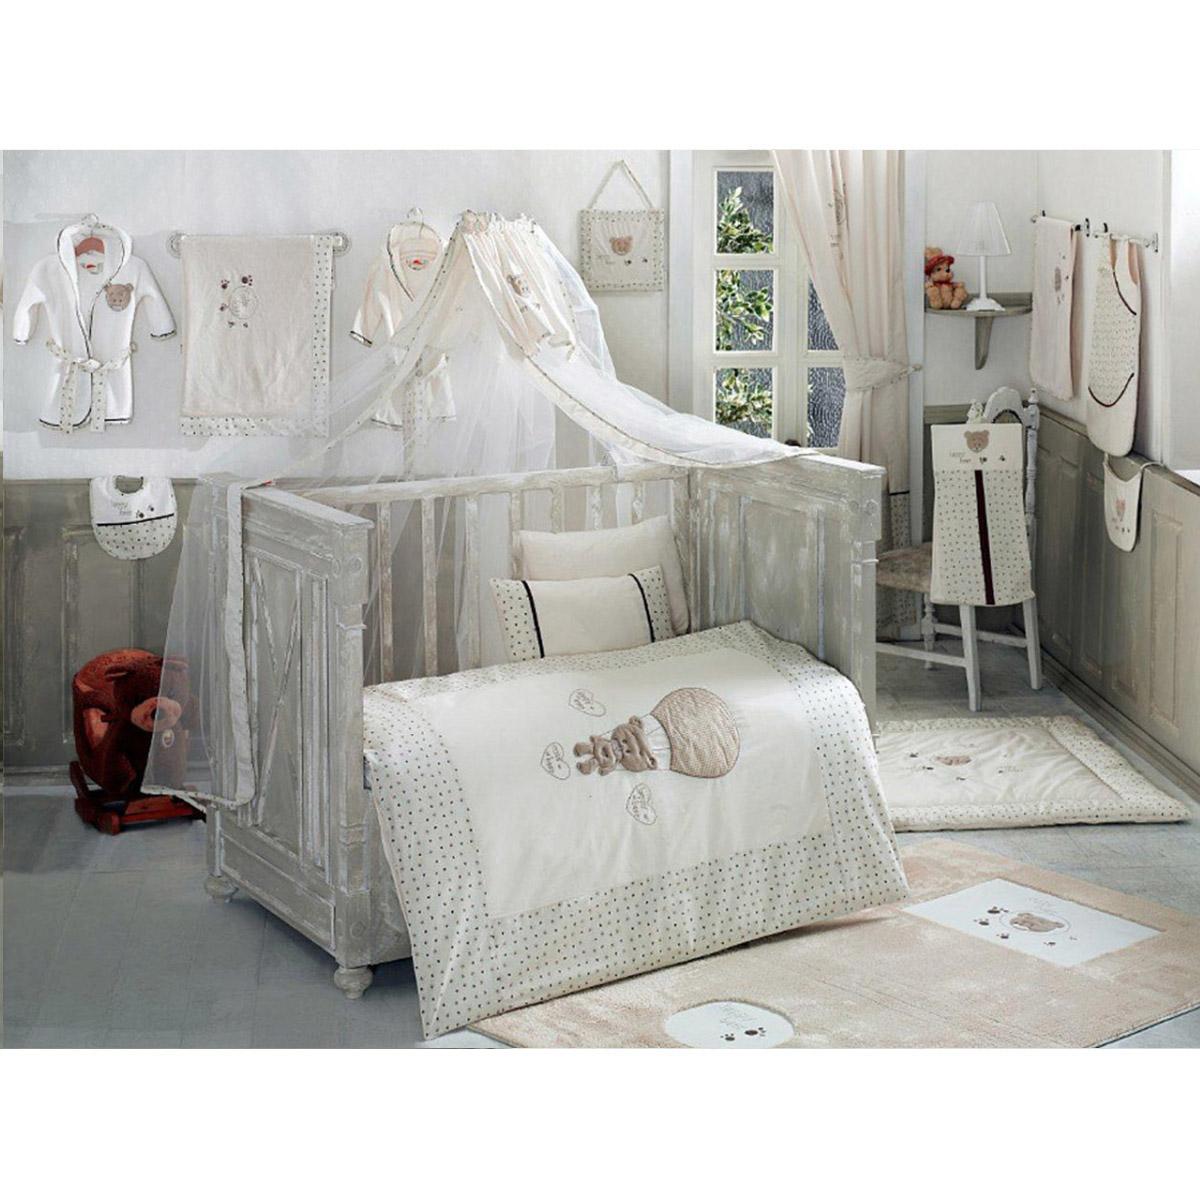 Балдахин серии Cute Bear 150 х 450 см, Beige - Спальня, артикул: 171435